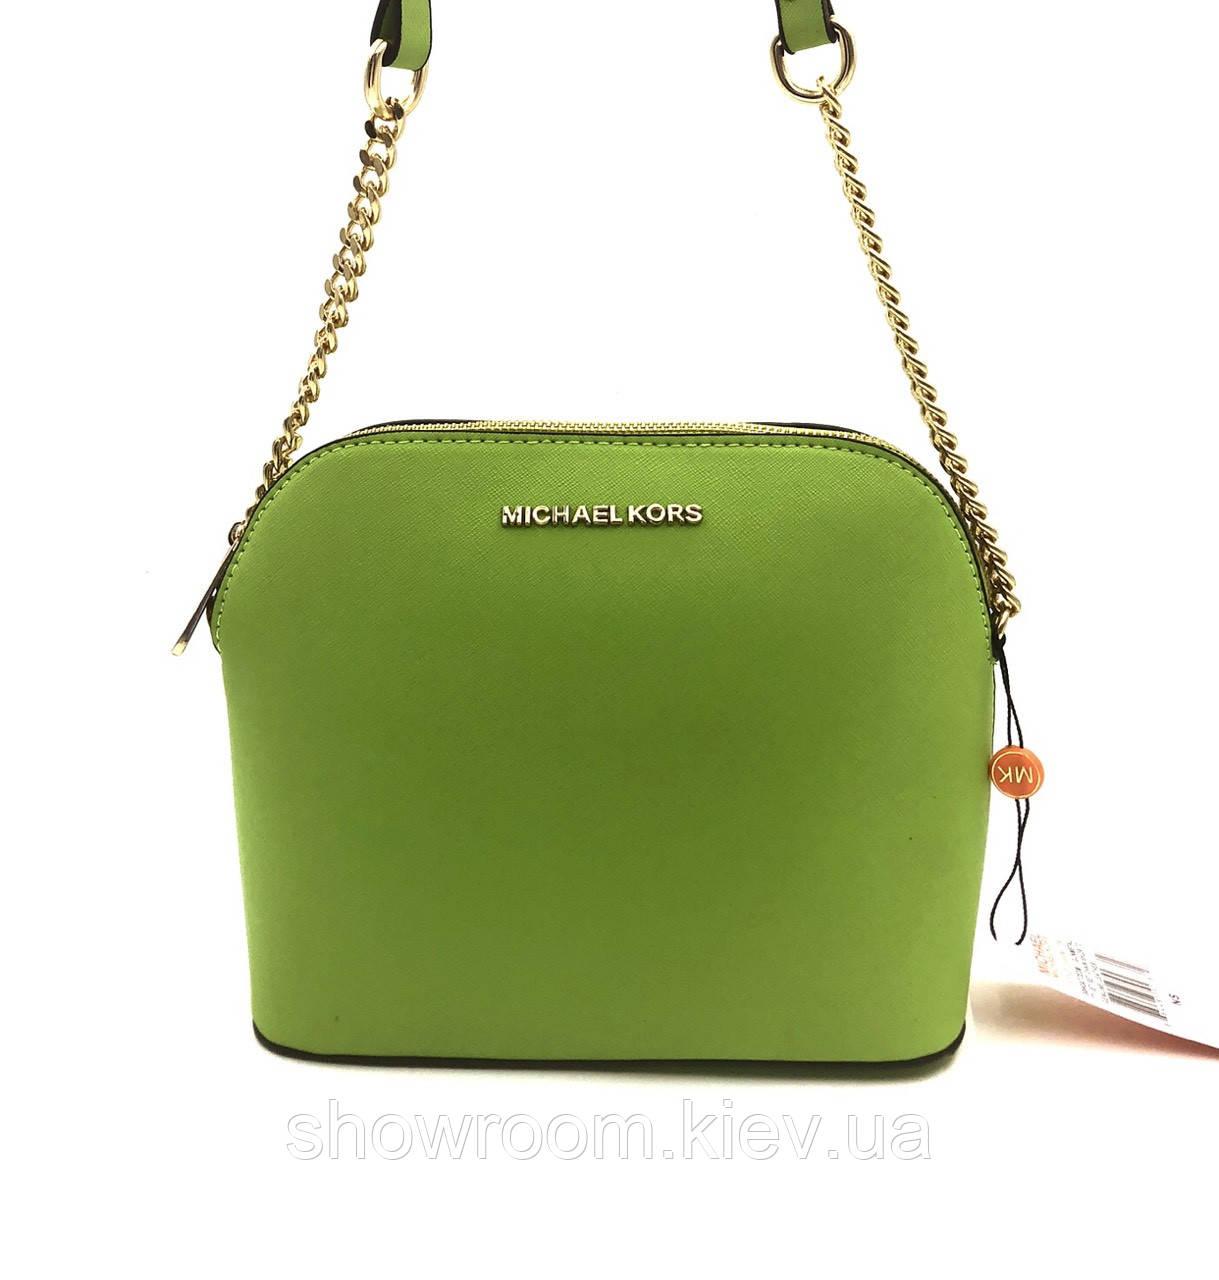 df81658defba клатч сумка Michael Kors в киеве продажа предложение цена